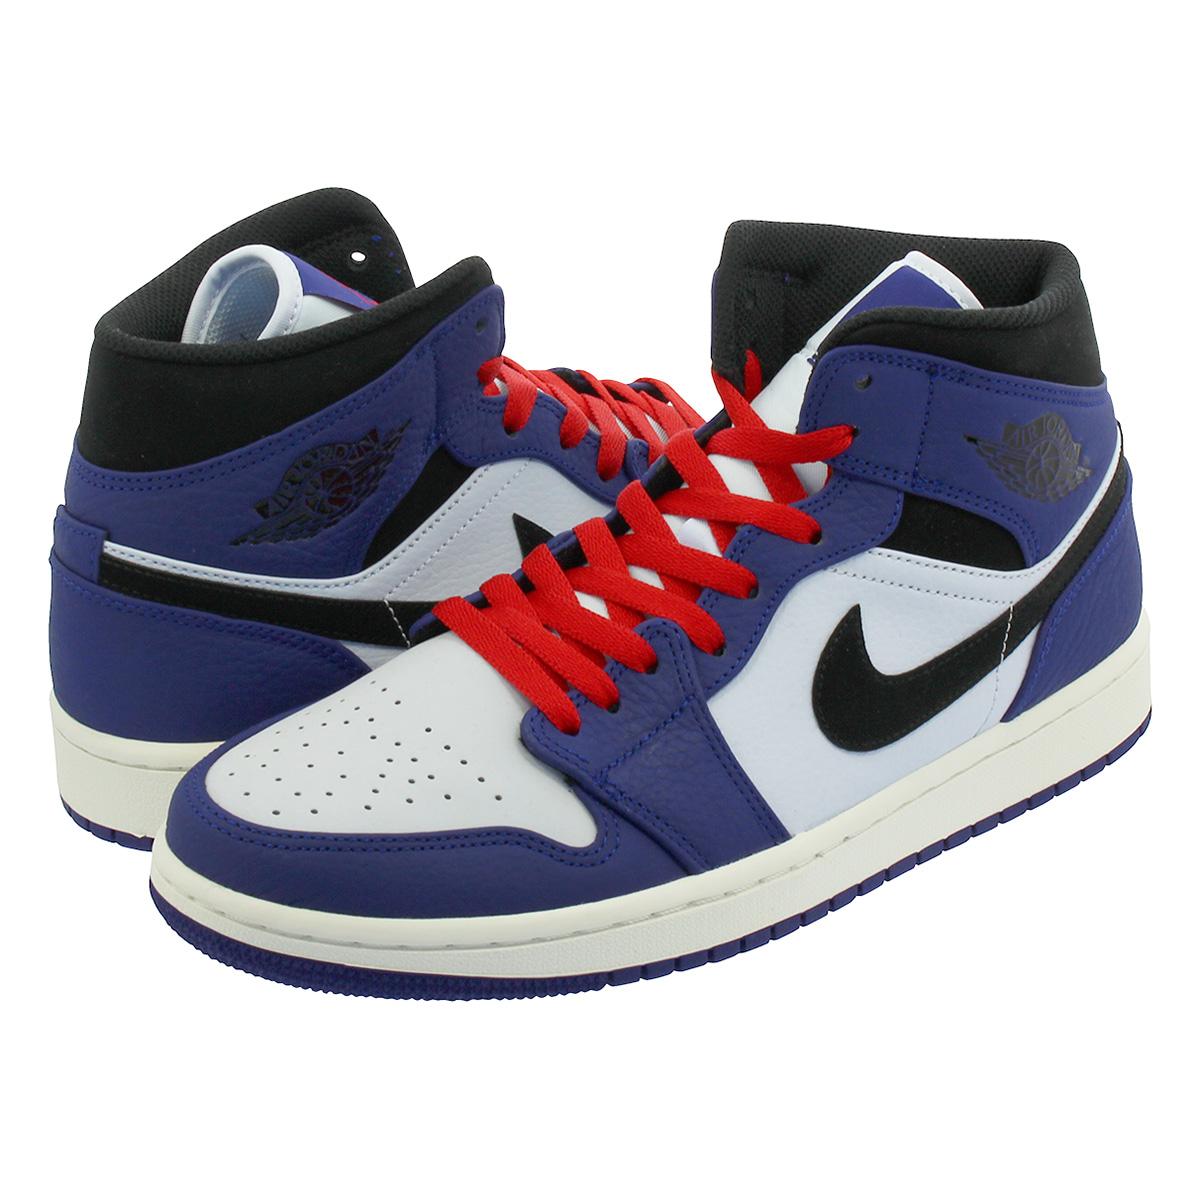 NIKE AIR JORDAN 1 MID SE Nike Air Jordan 1 mid SE DEEP ROYAL BLUE/BLACK  852,542-400